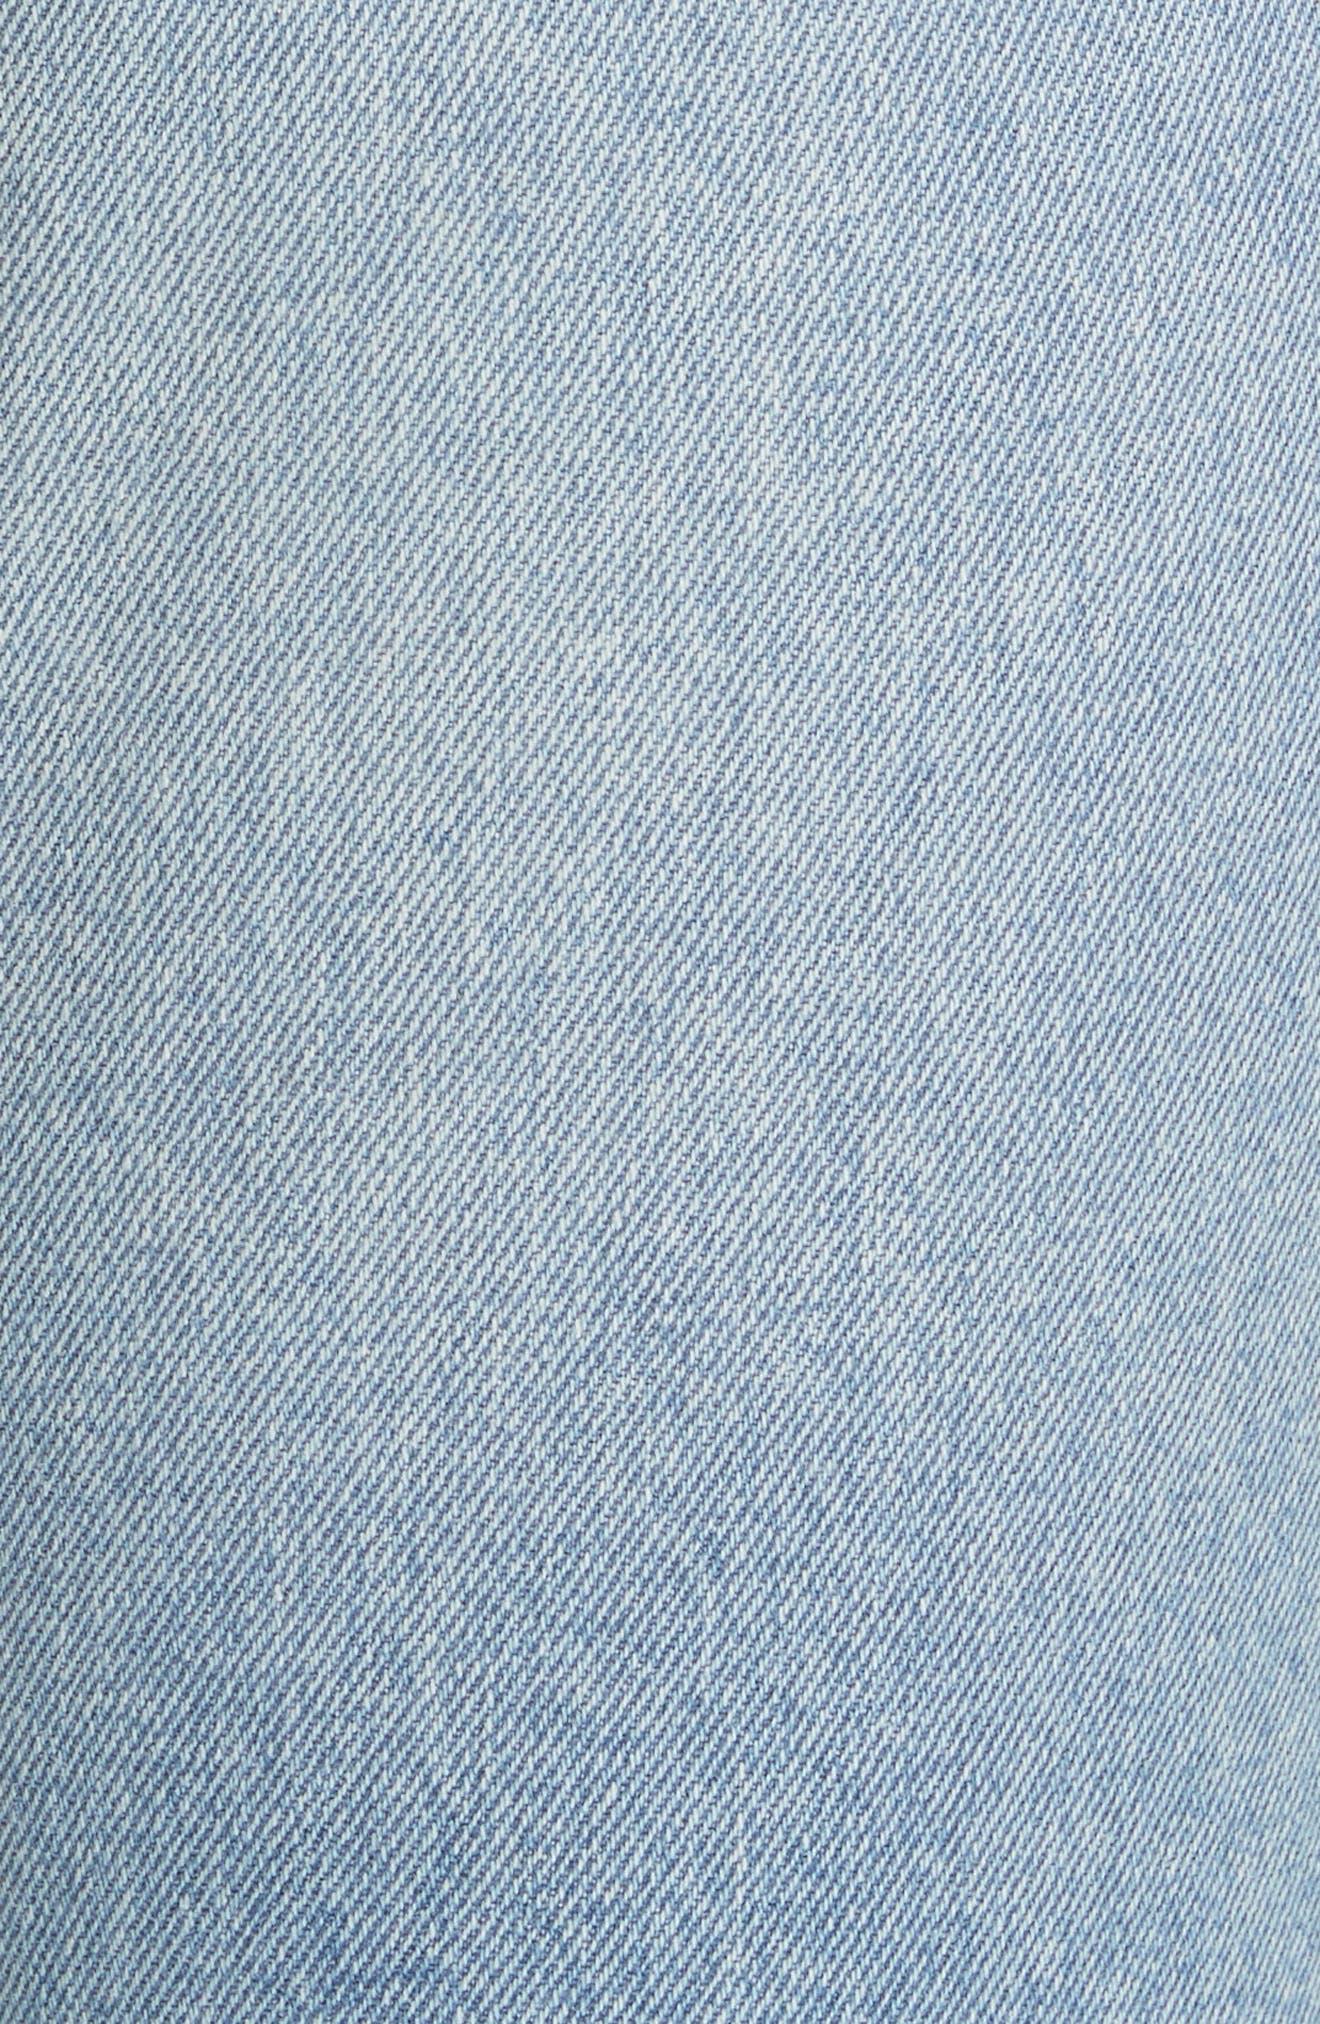 Karolina Ripped Skinny Jeans,                             Alternate thumbnail 4, color,                             Treasure